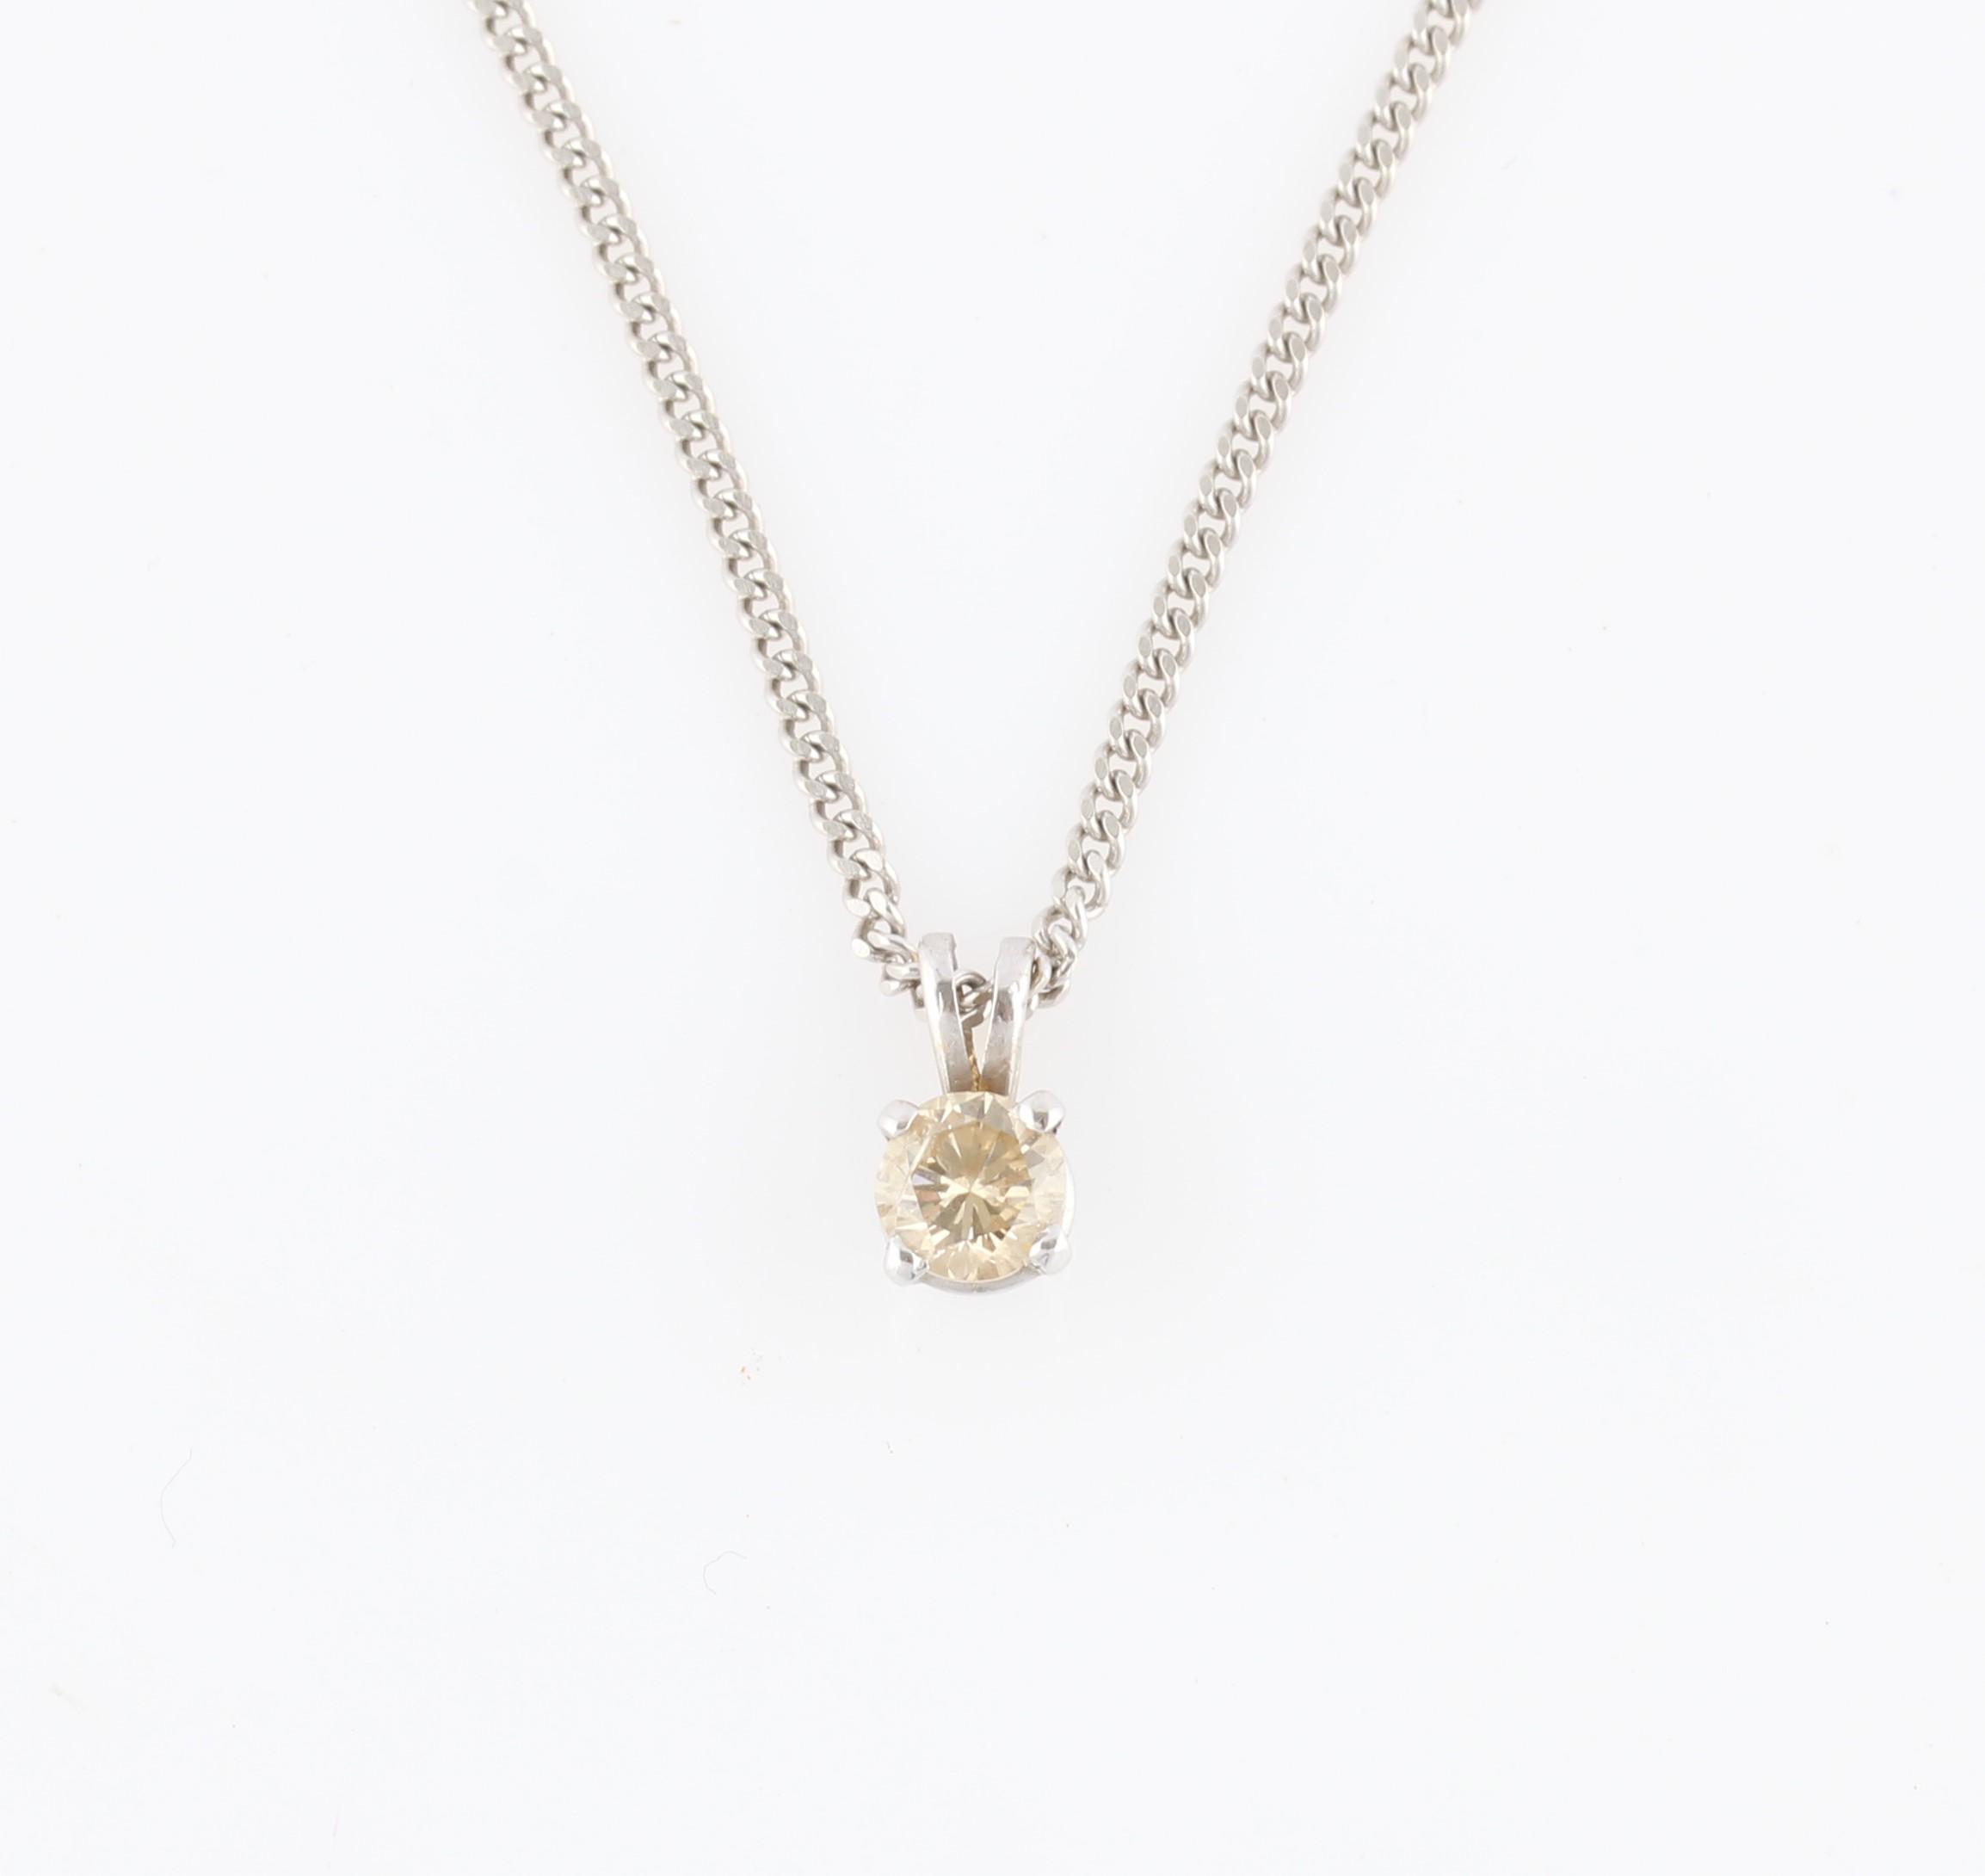 Lot 29 - A single stone diamond pendant, set with a round brilliant cut diamond, measuring approx. 0.50ct, on